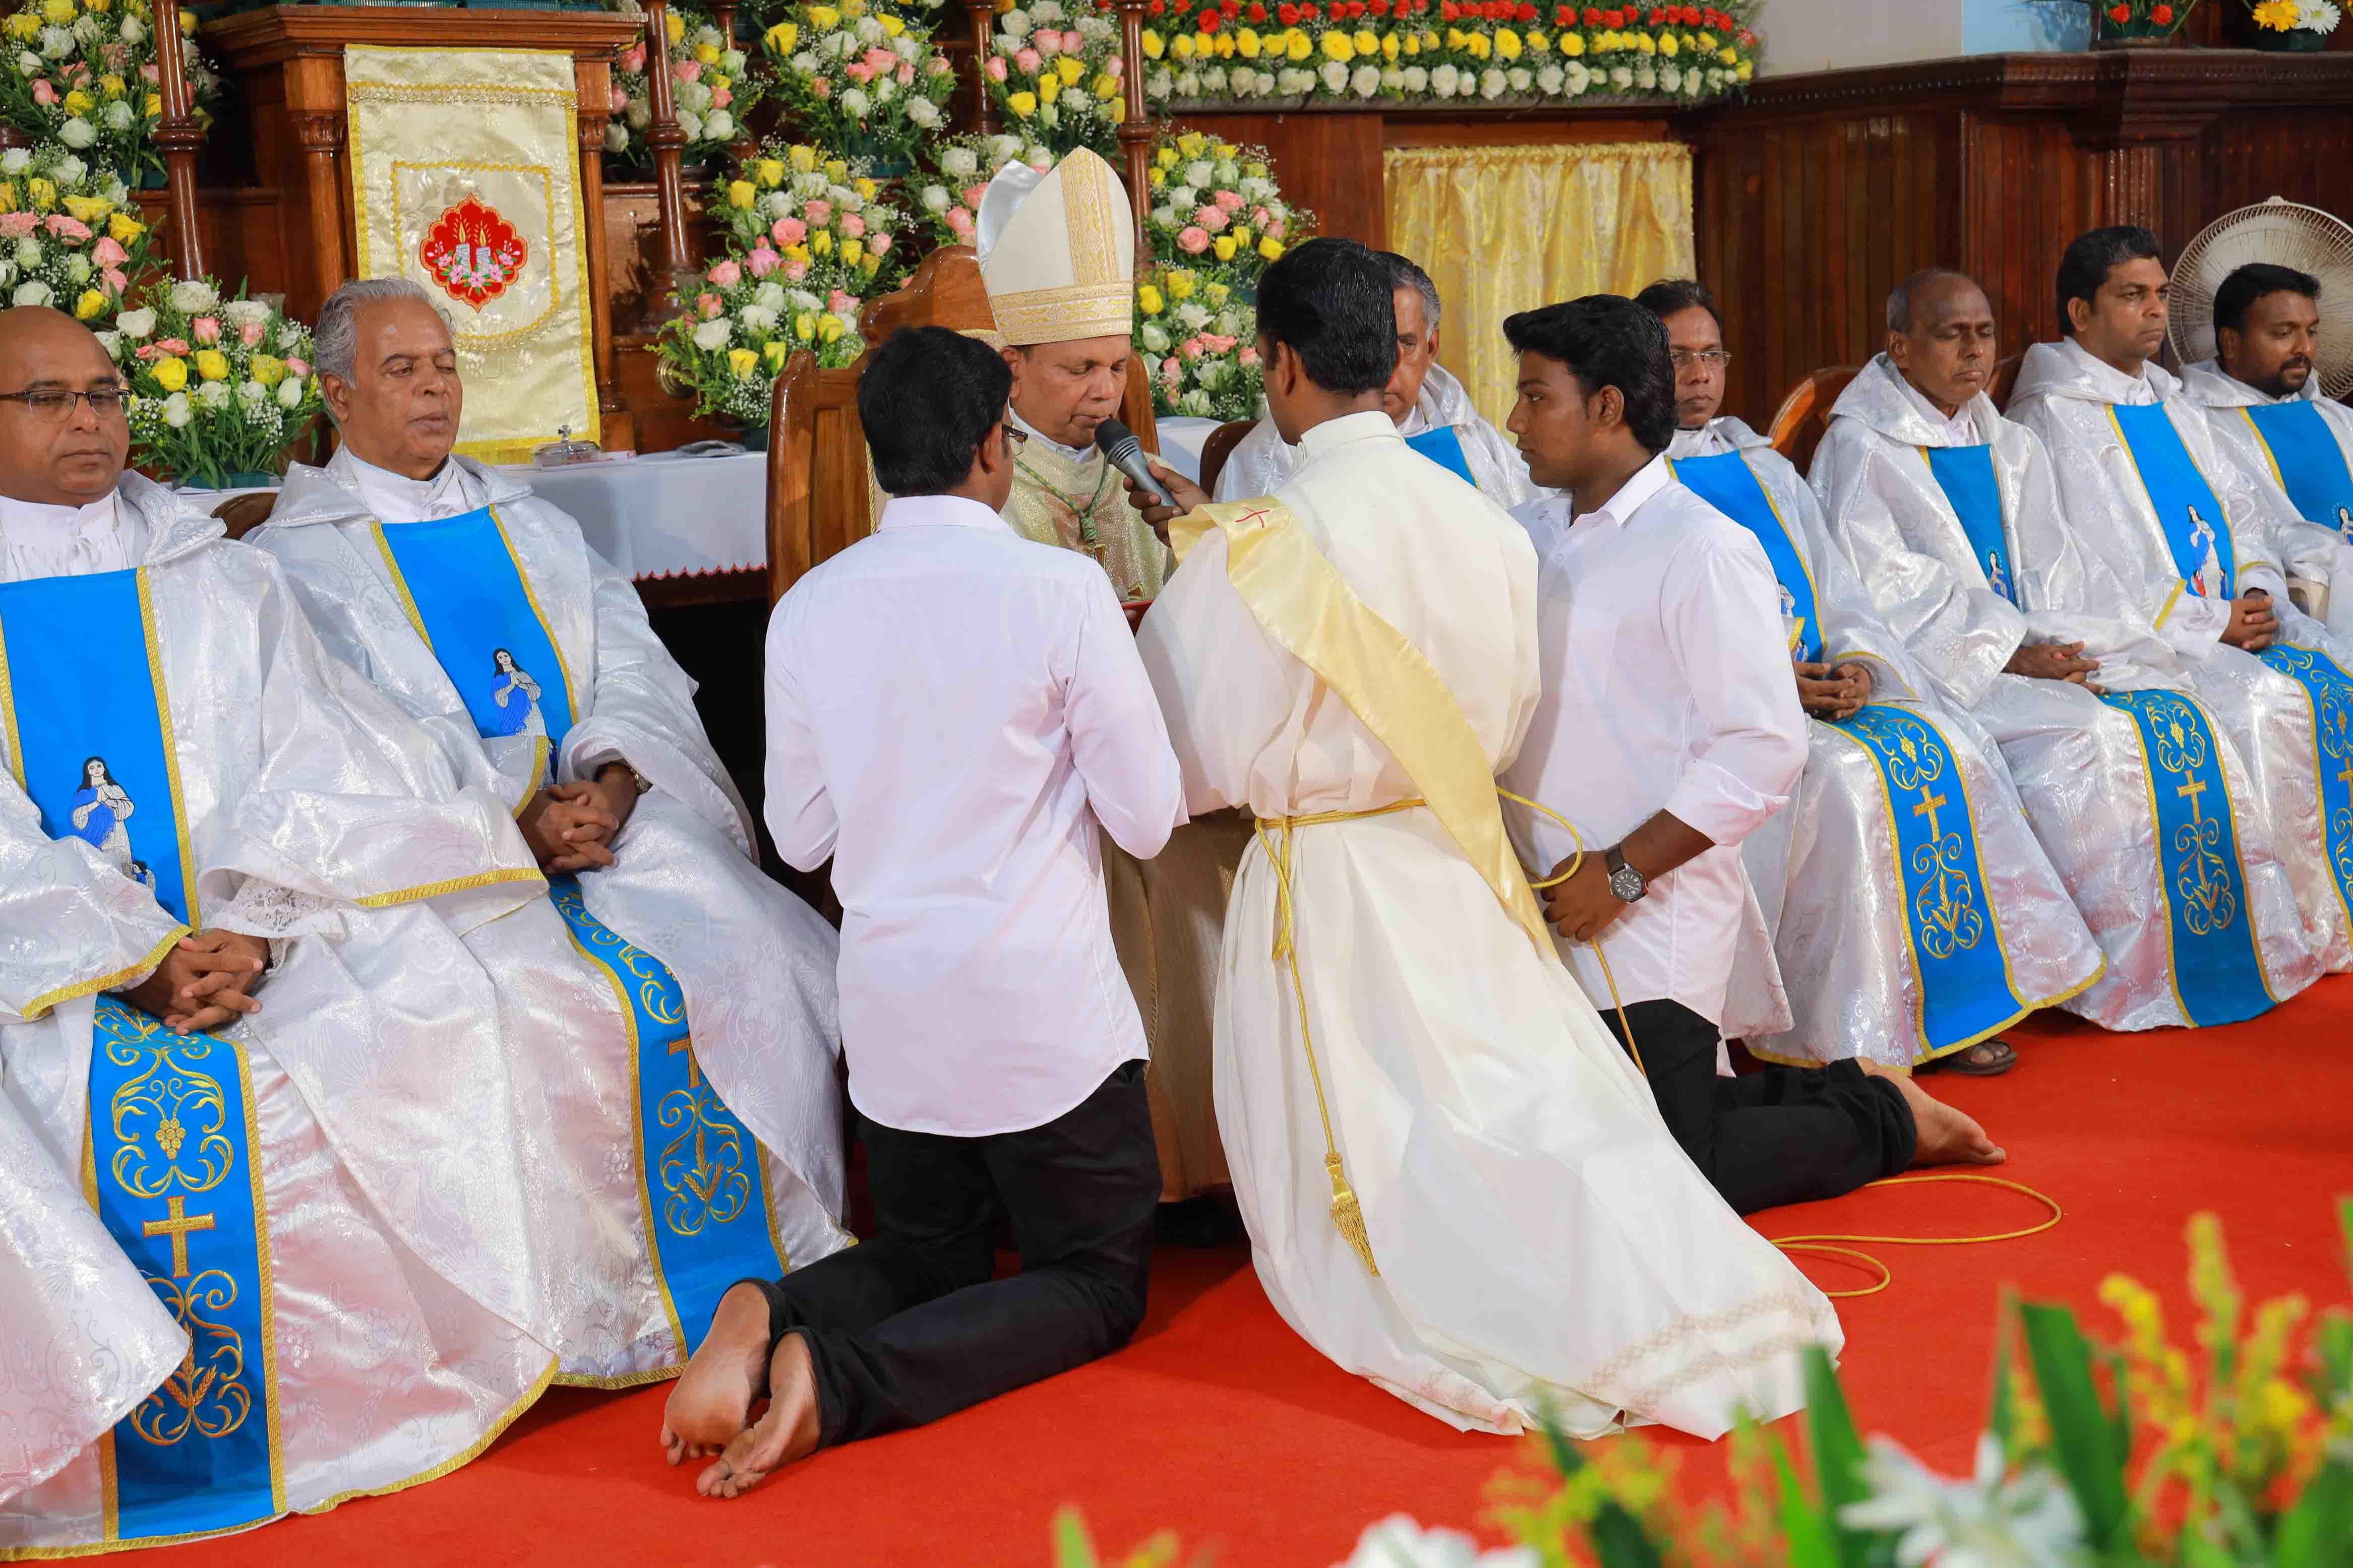 Fr. Anuraj Ordination